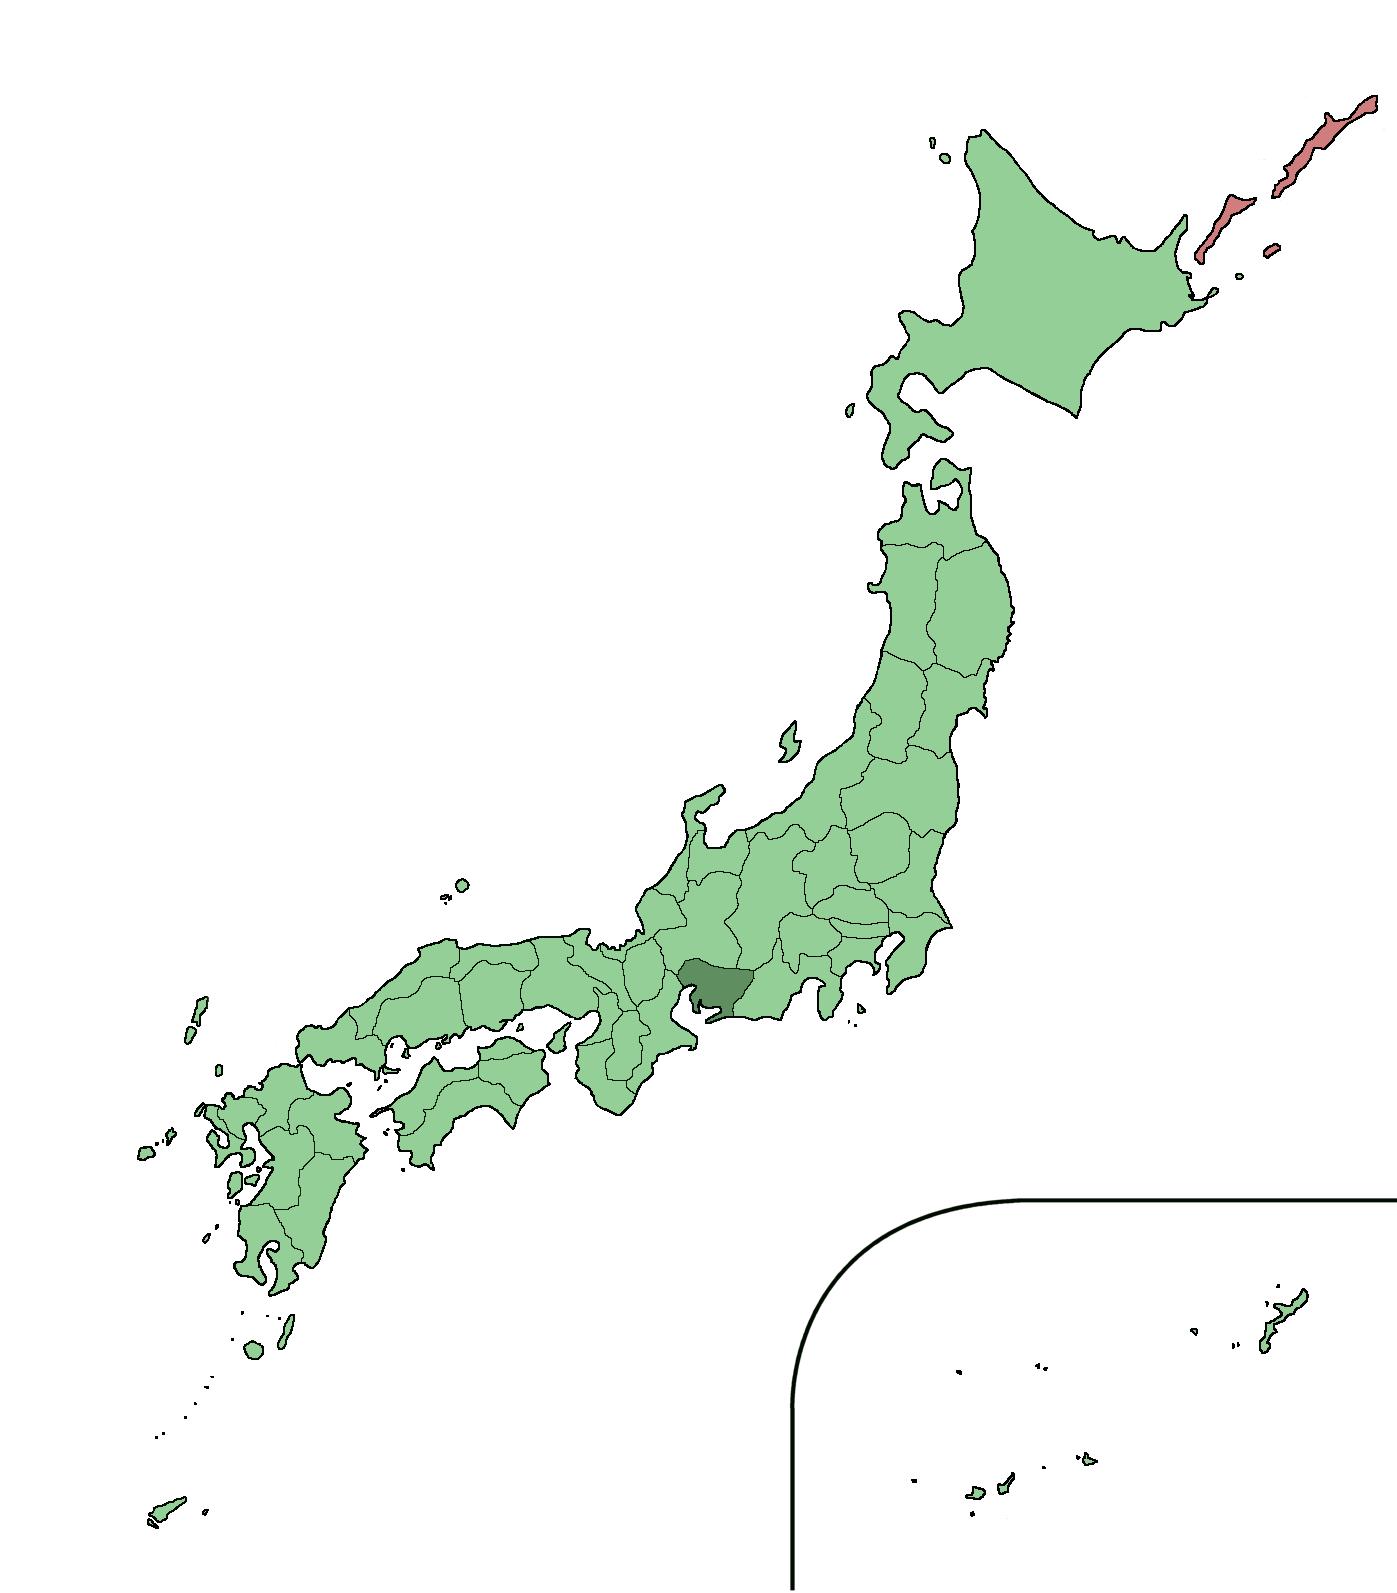 FileJapan Aichi Largepng Wikimedia Commons - Japan map aichi